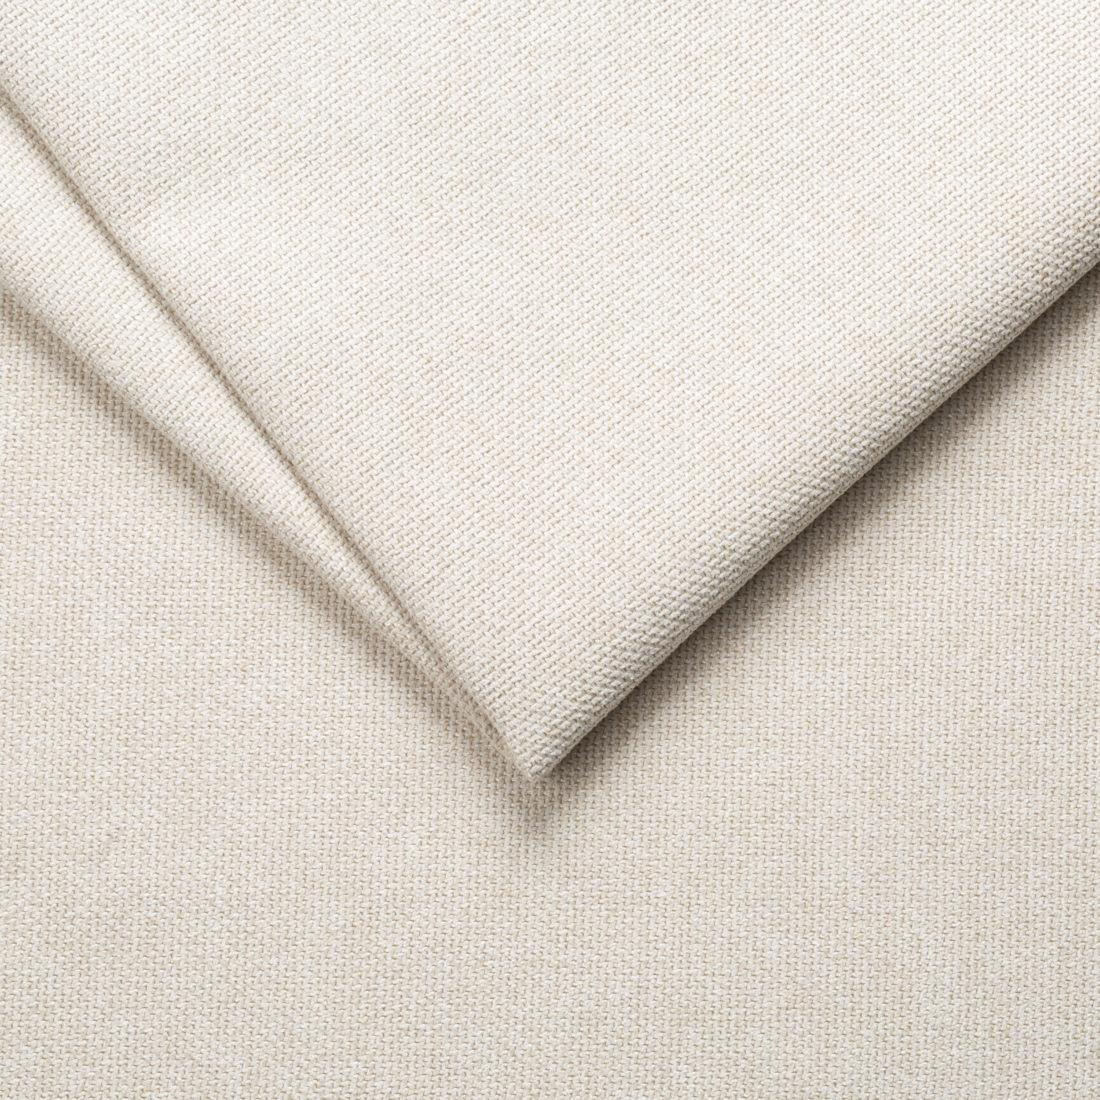 Мебельная ткань Austin 1 Ivory, рогожка